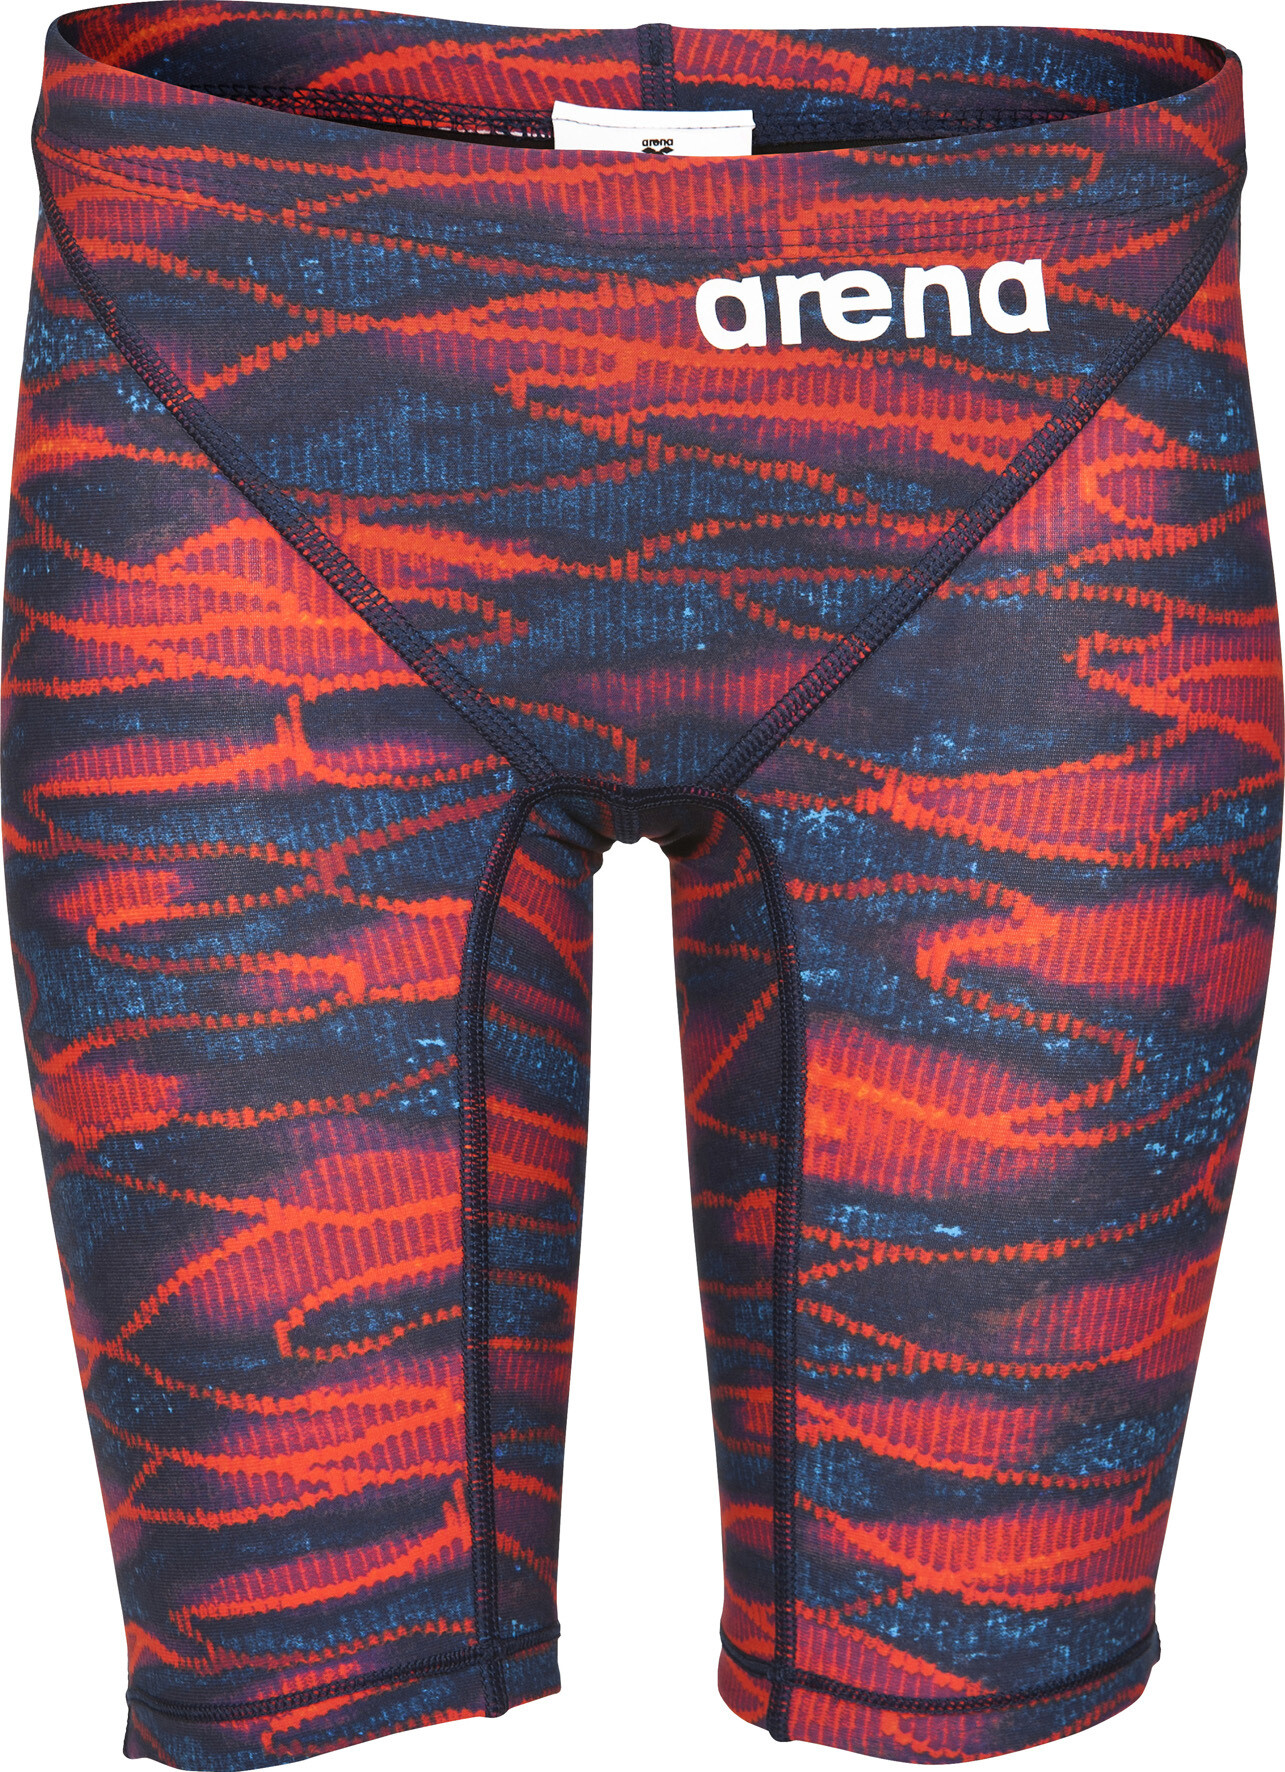 arena Powerskin ST 2.0 LTD Edition Badebukser Drenge, blue-red | swim_clothes